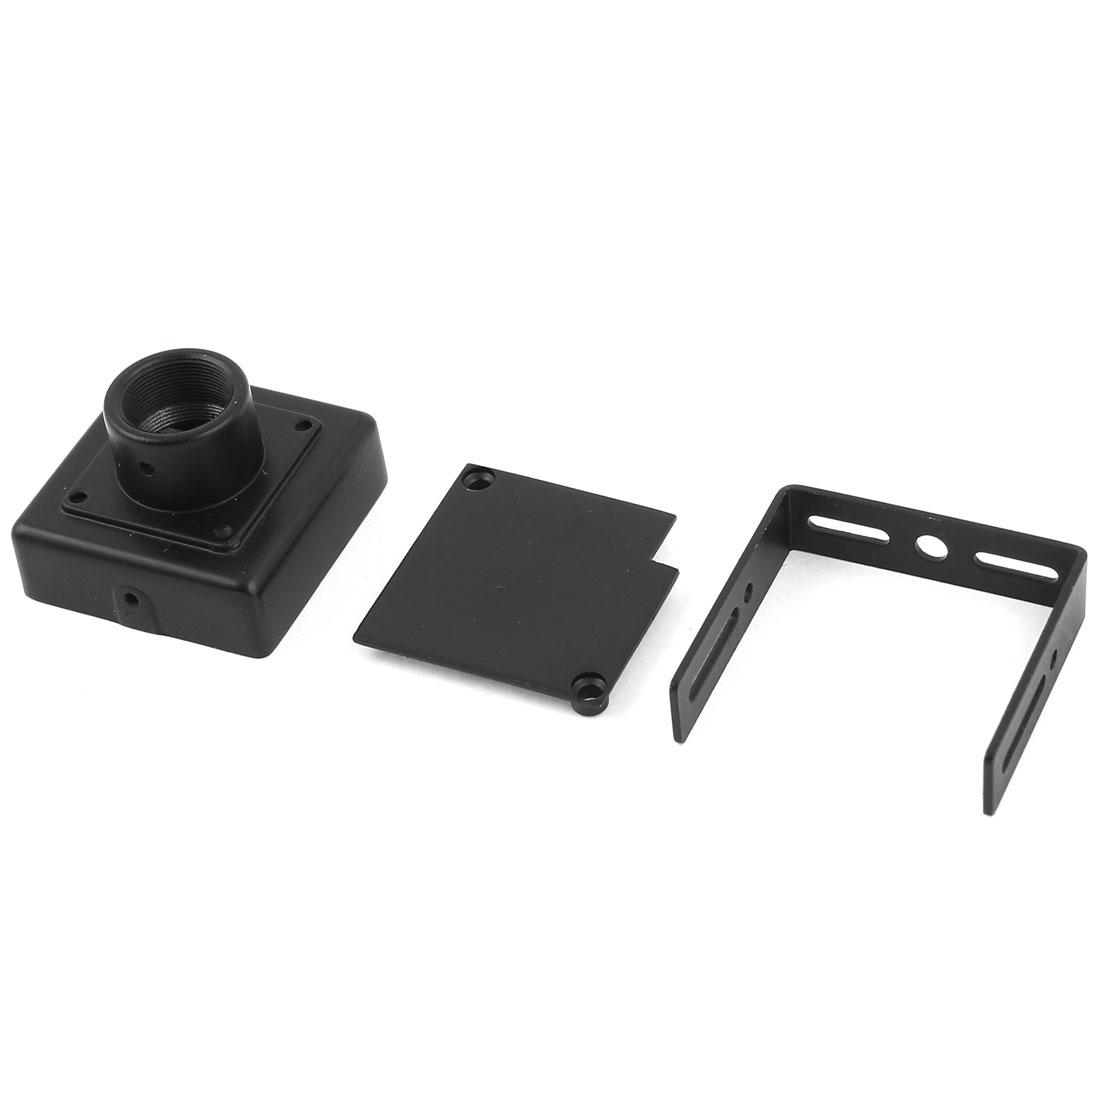 HD33 Black Metal CCTV Camera Lens Fixed Mount Box Housing M12